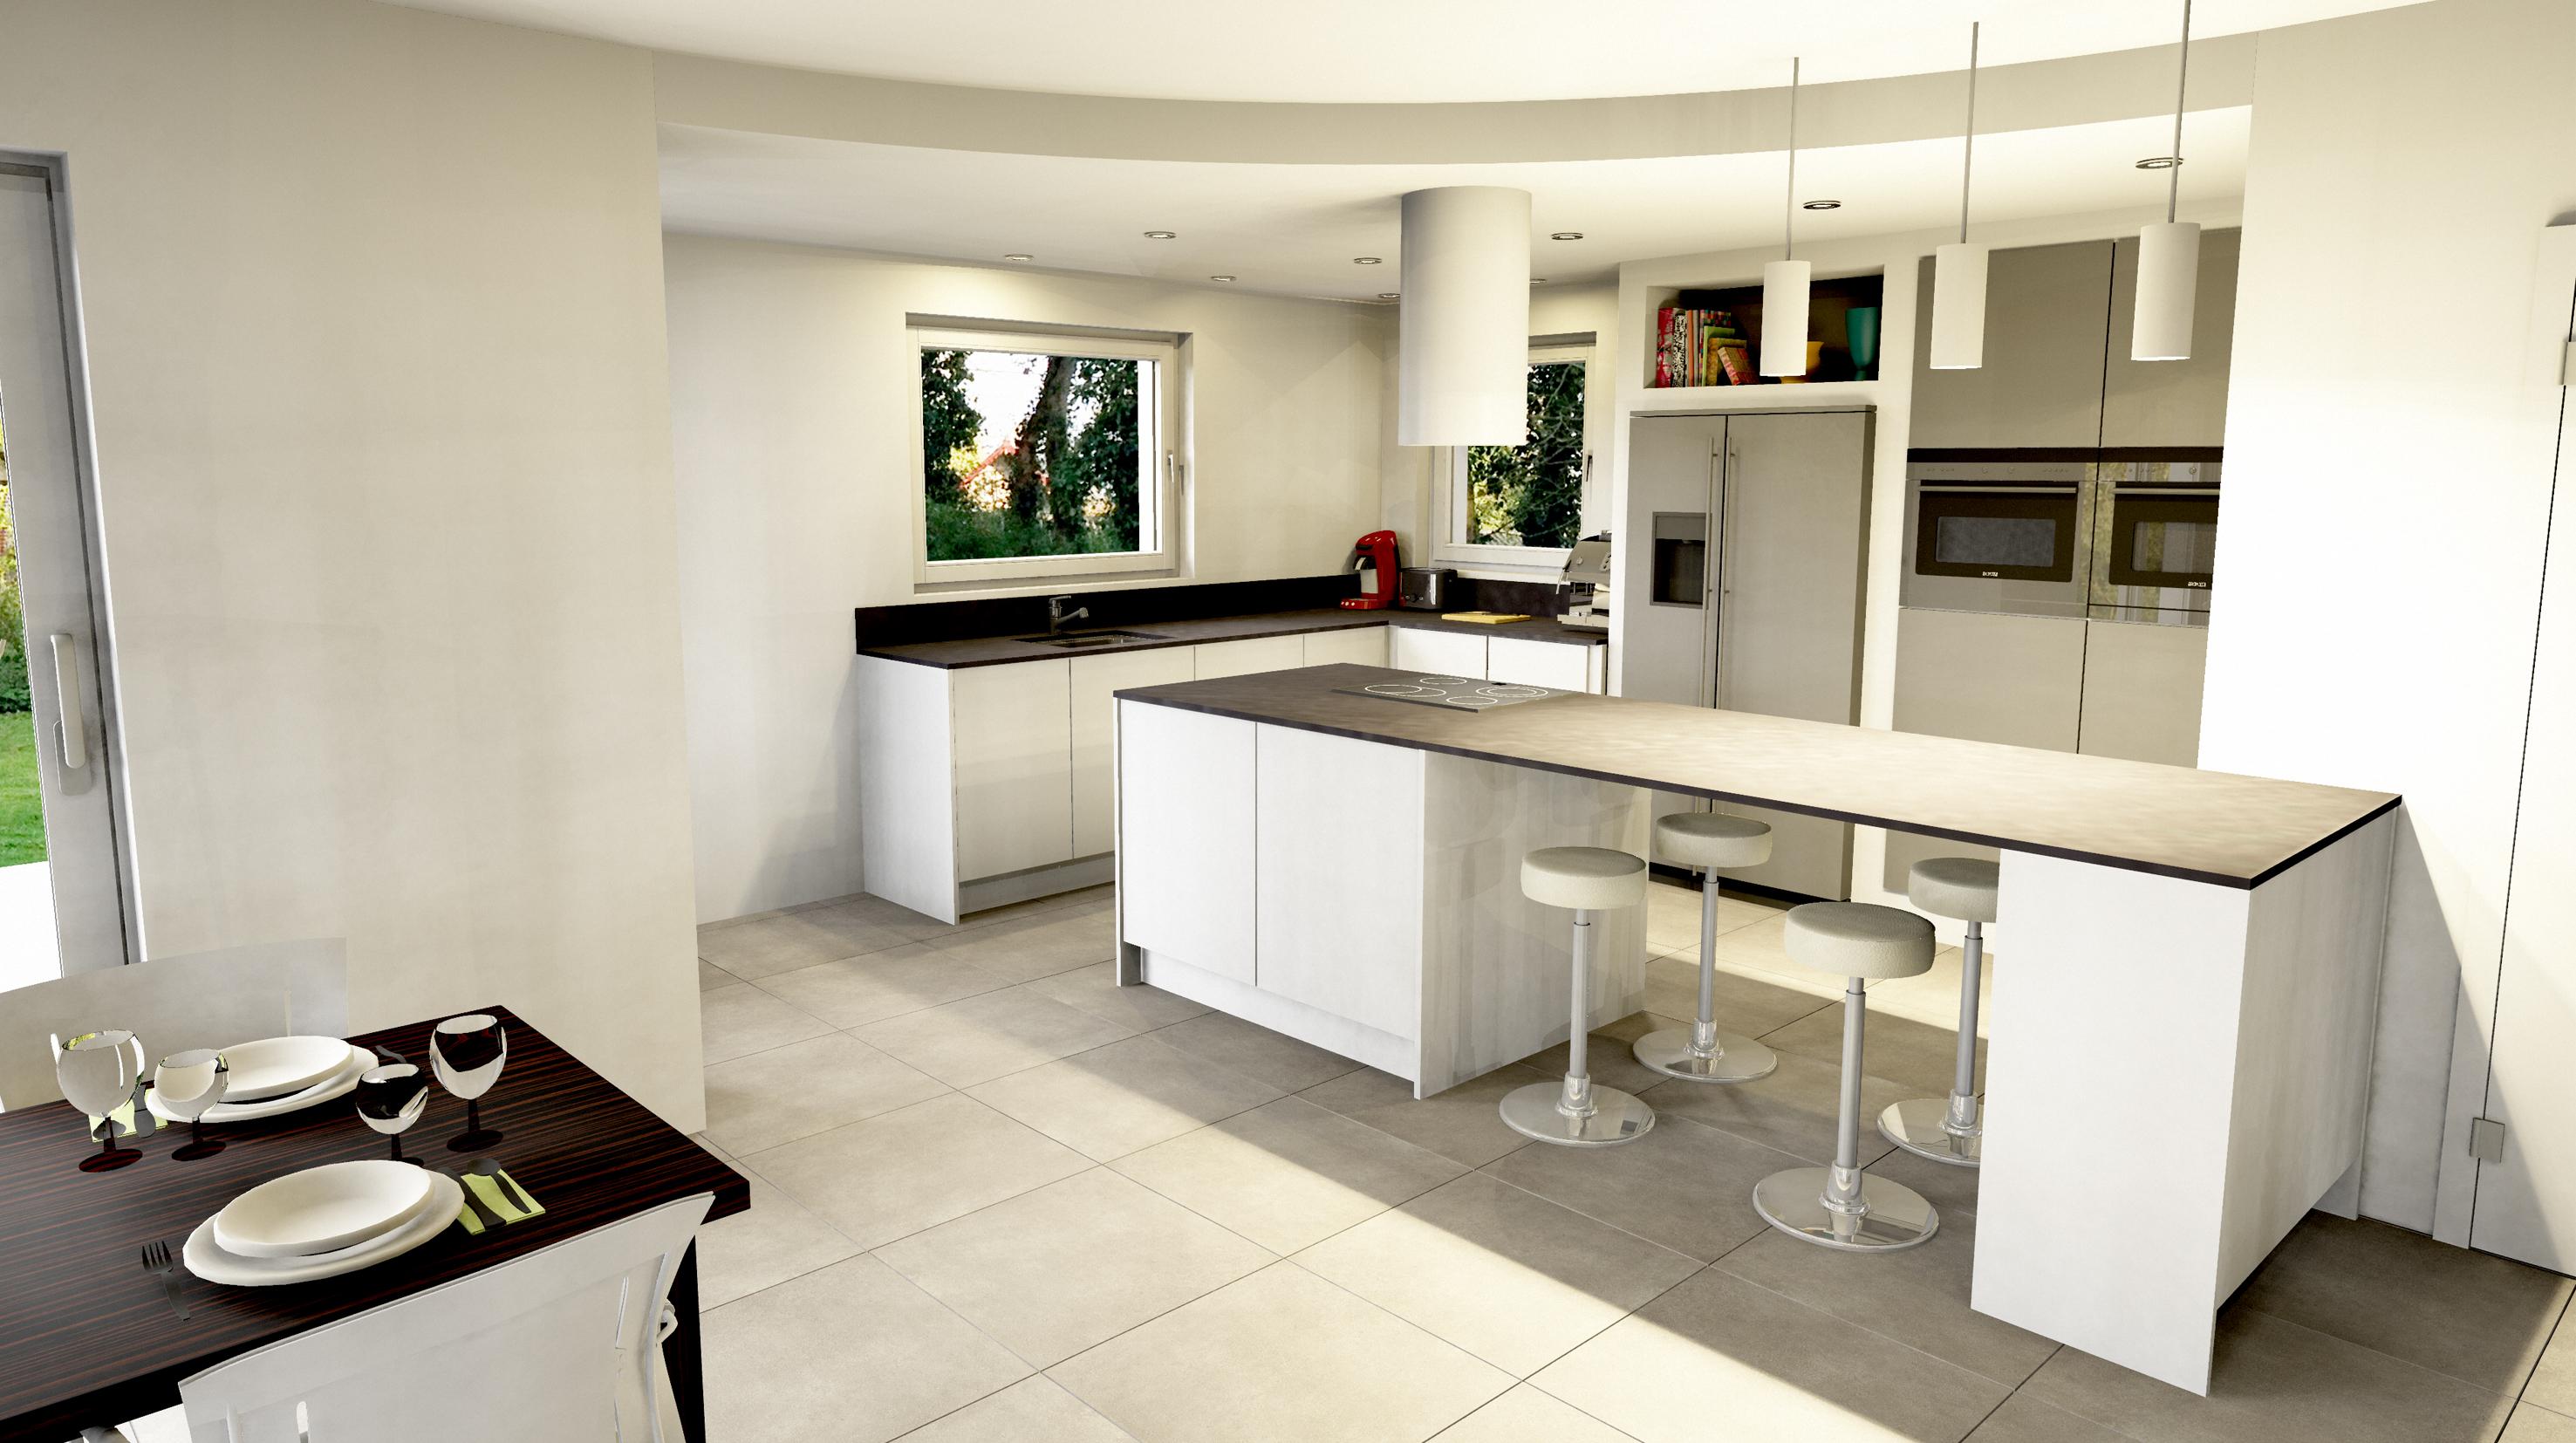 Cuisine a l americaine boddaert interieur architecte interieur lille nord - Modele de cuisine moderne americaine ...